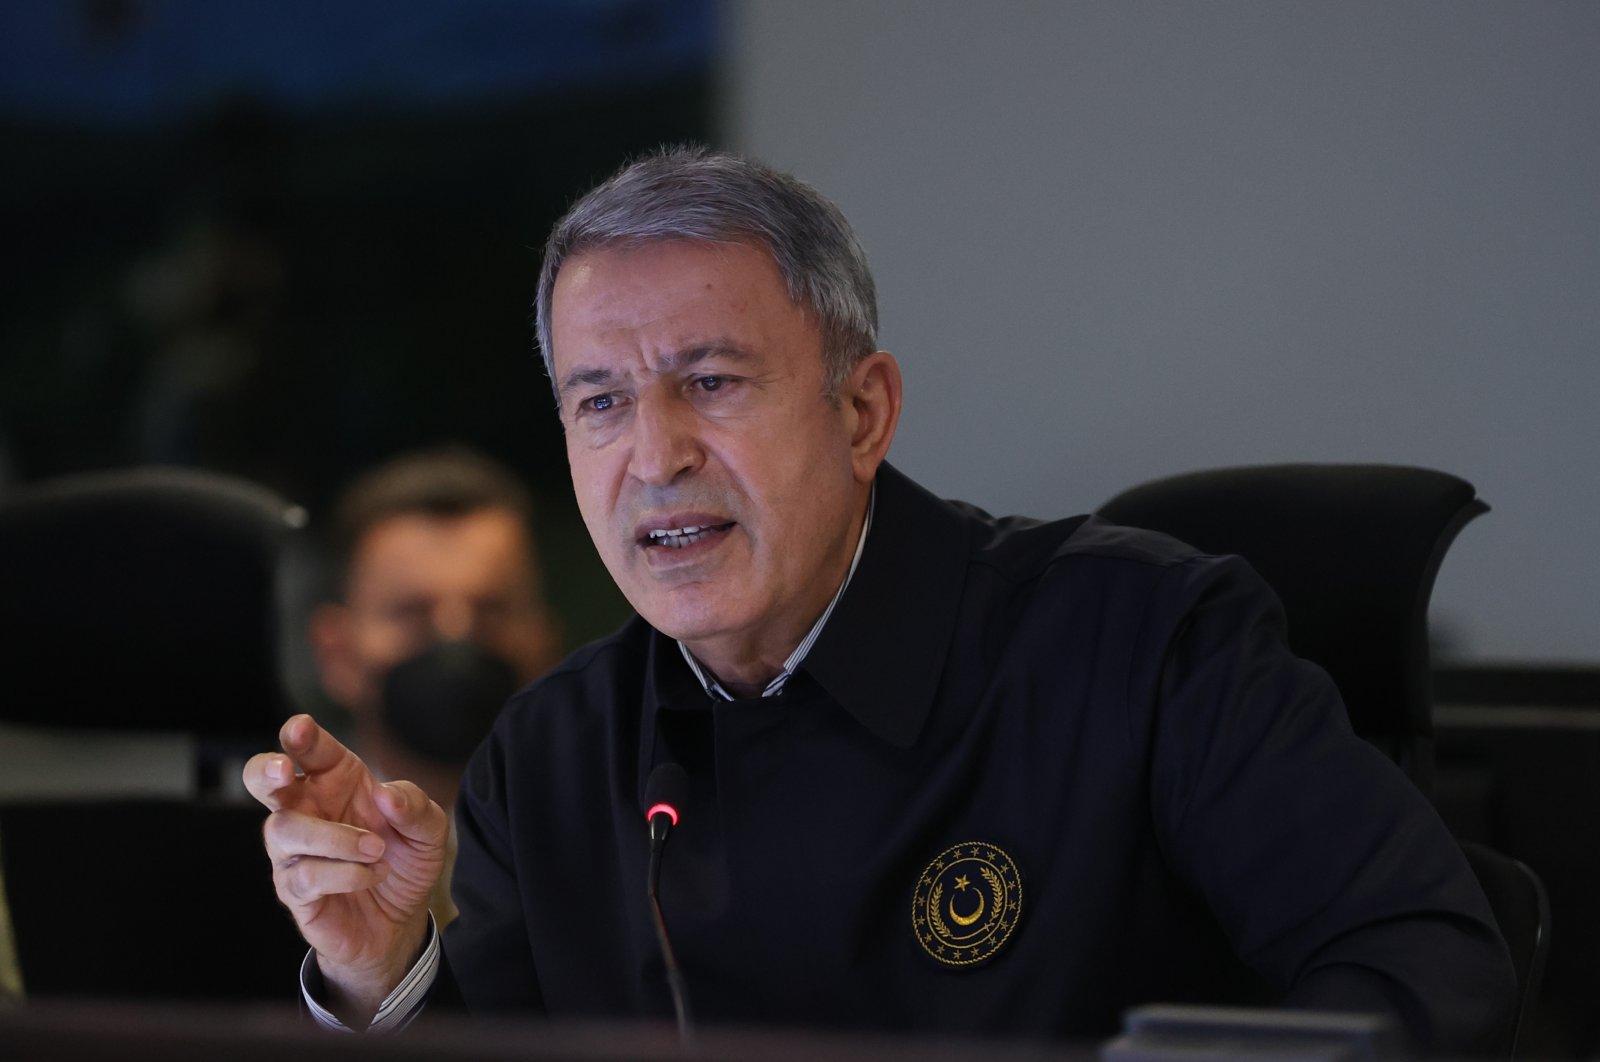 Defense Minister Hulusi Akar speaks at the Eskişehir Air Force Command headquarters in Eskişehir, Turkey, May 3, 2021. (AA Photo)